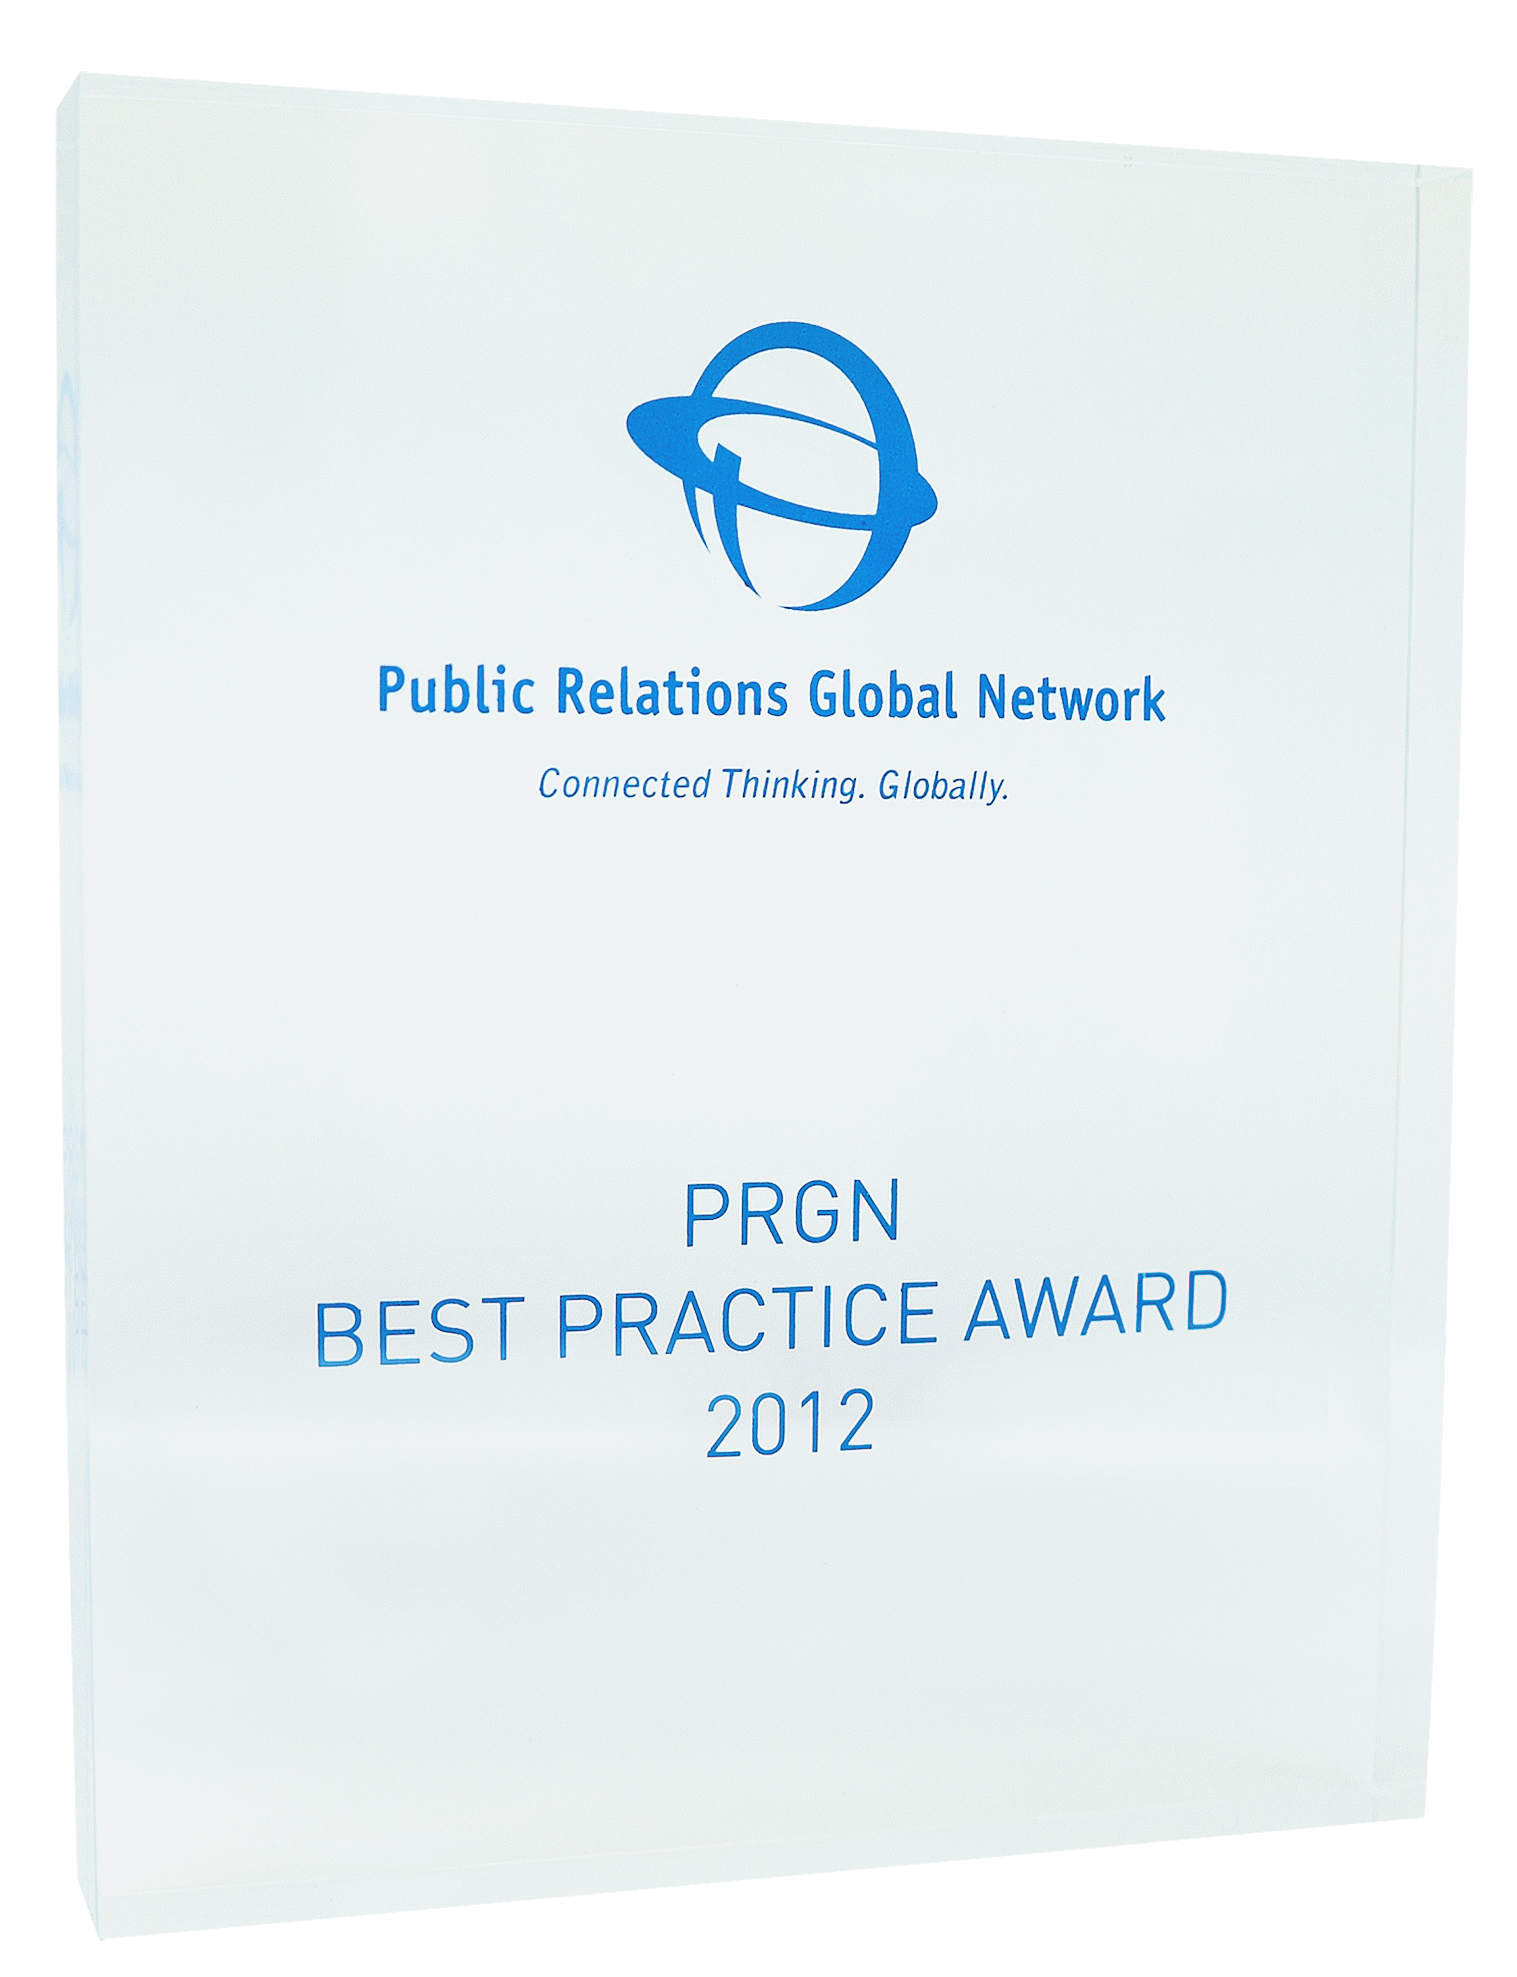 PRGN_Best Pratice Award_2012